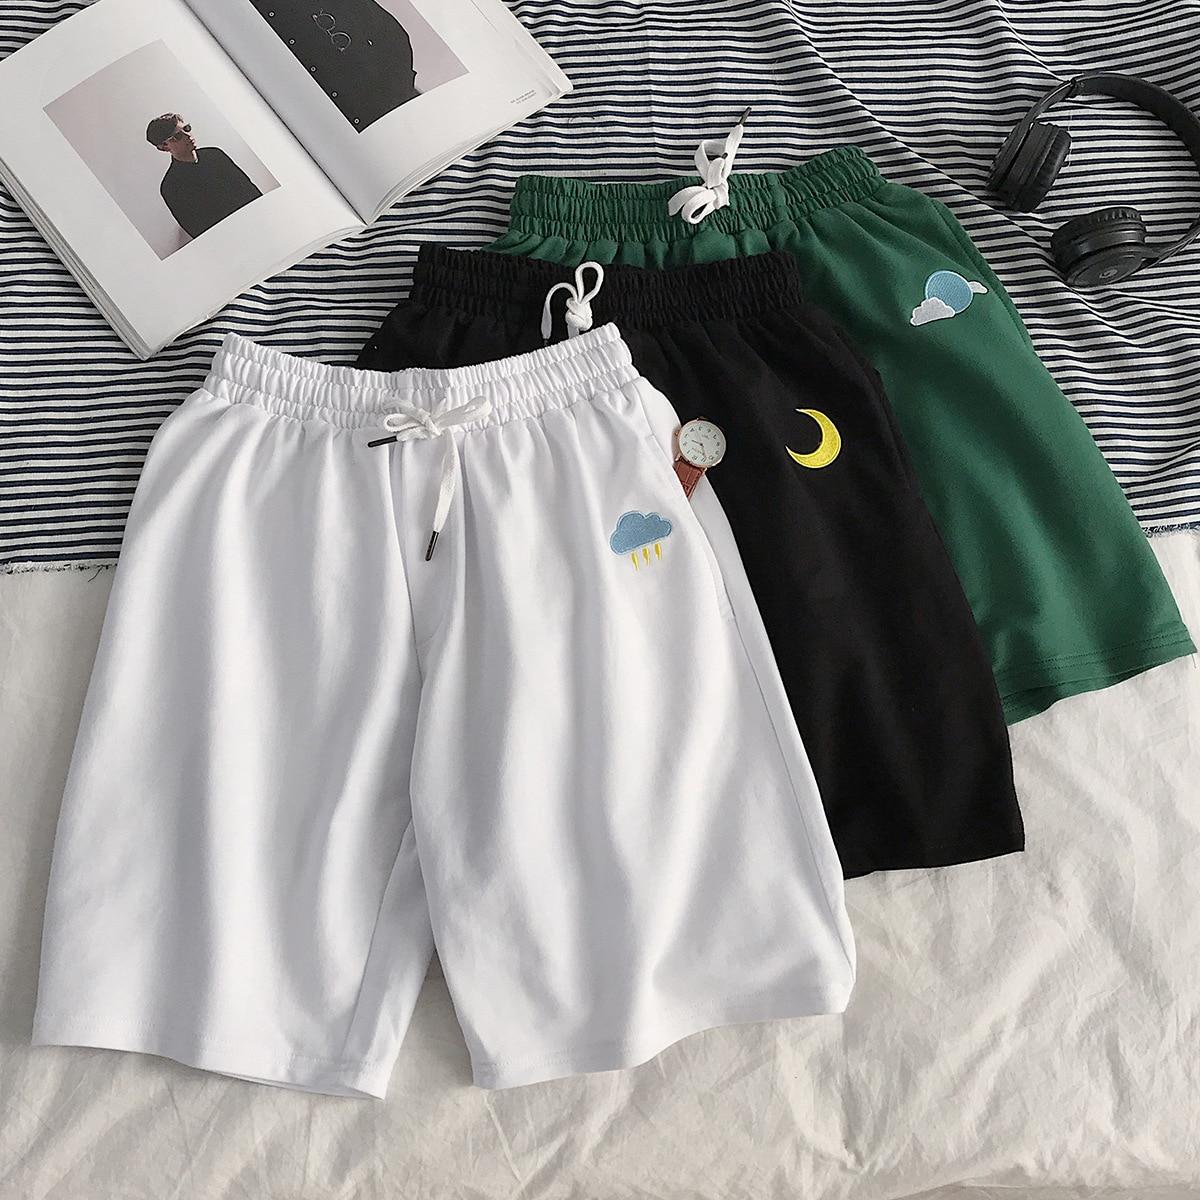 Hong Kong Style Summer Short Shorts Men's Loose-Fit Sports 5 Casual Pants Popular Brand Online Celebrity INS Trend Versatile Sho